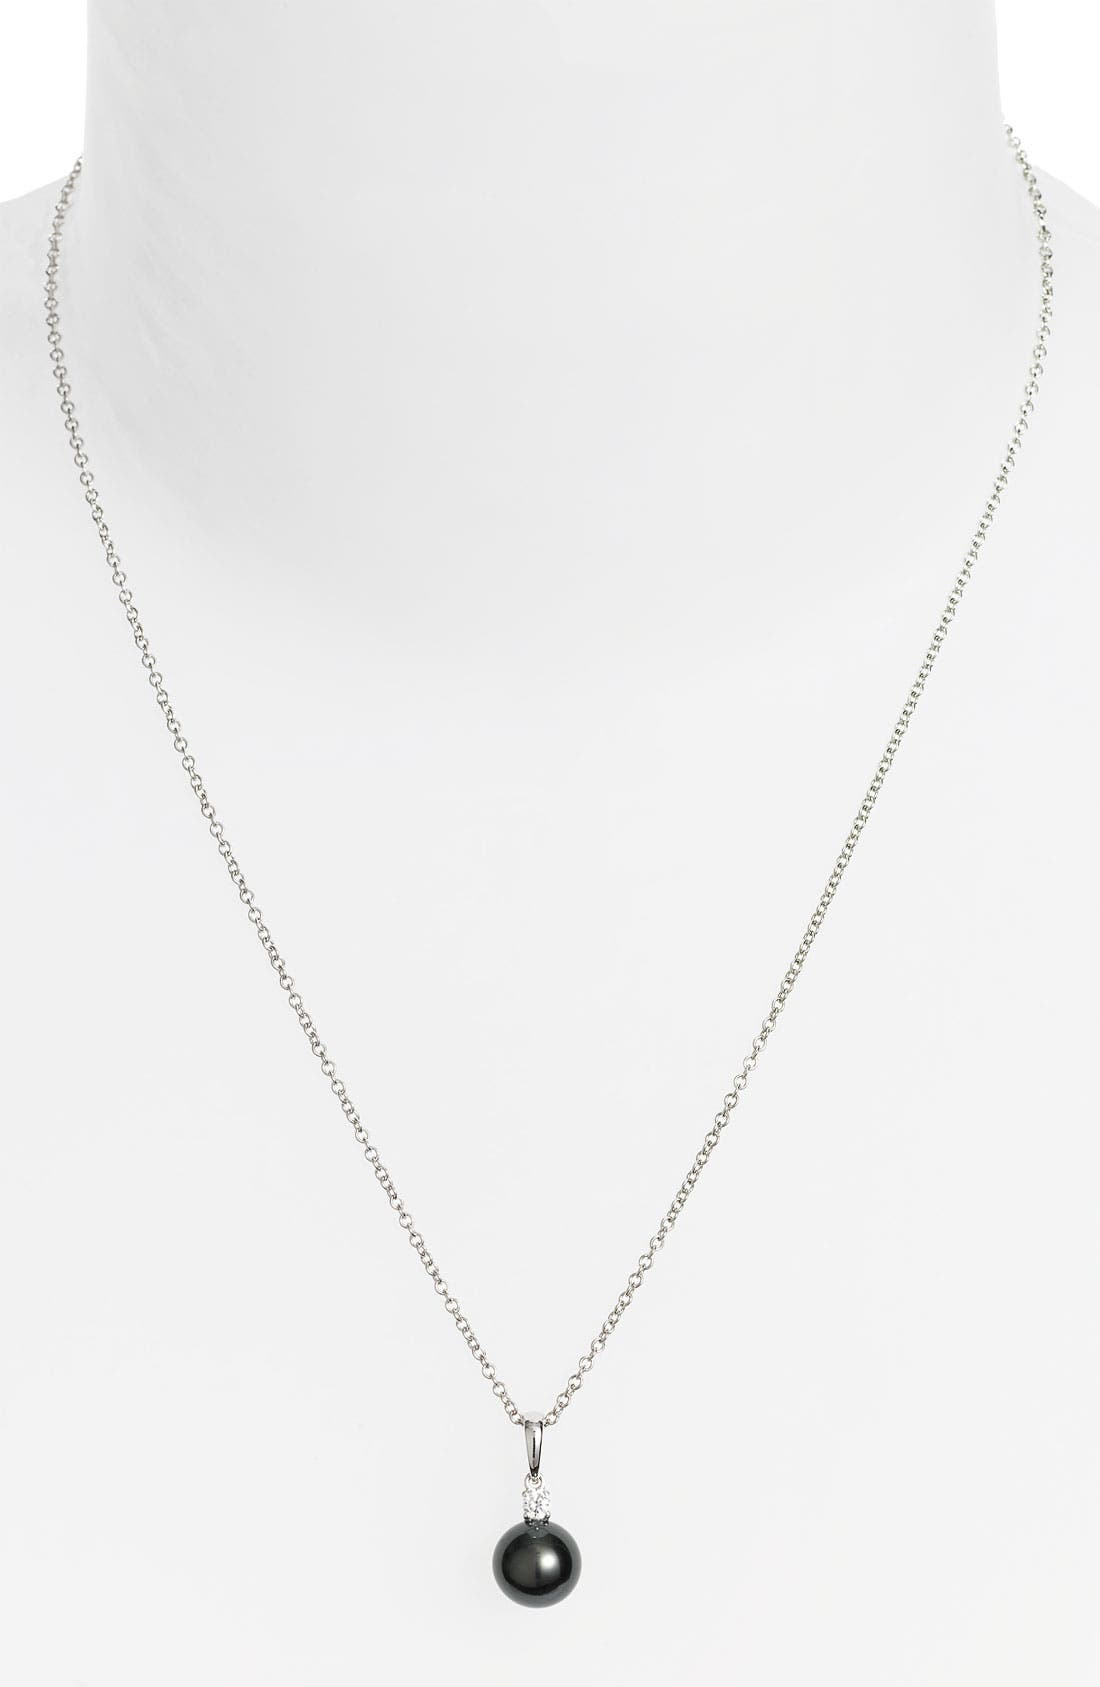 Main Image - Mikimoto Diamond & Black South Sea Cultured Pearl Pendant Necklace